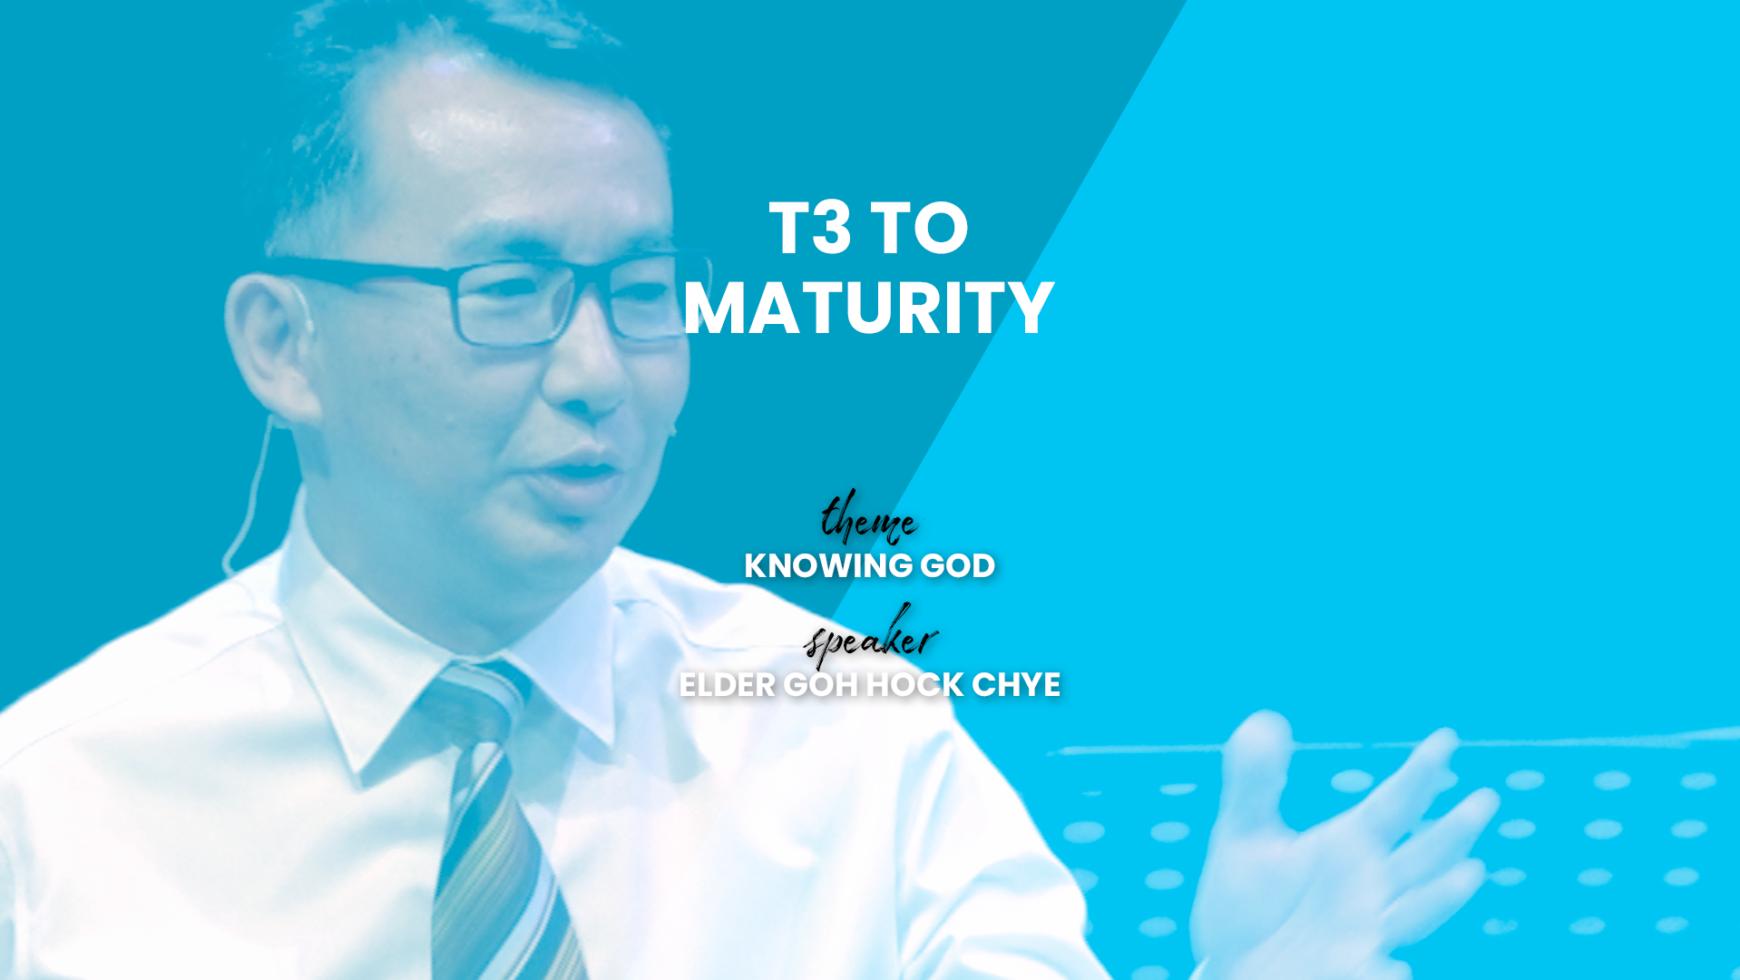 T3 to Maturity